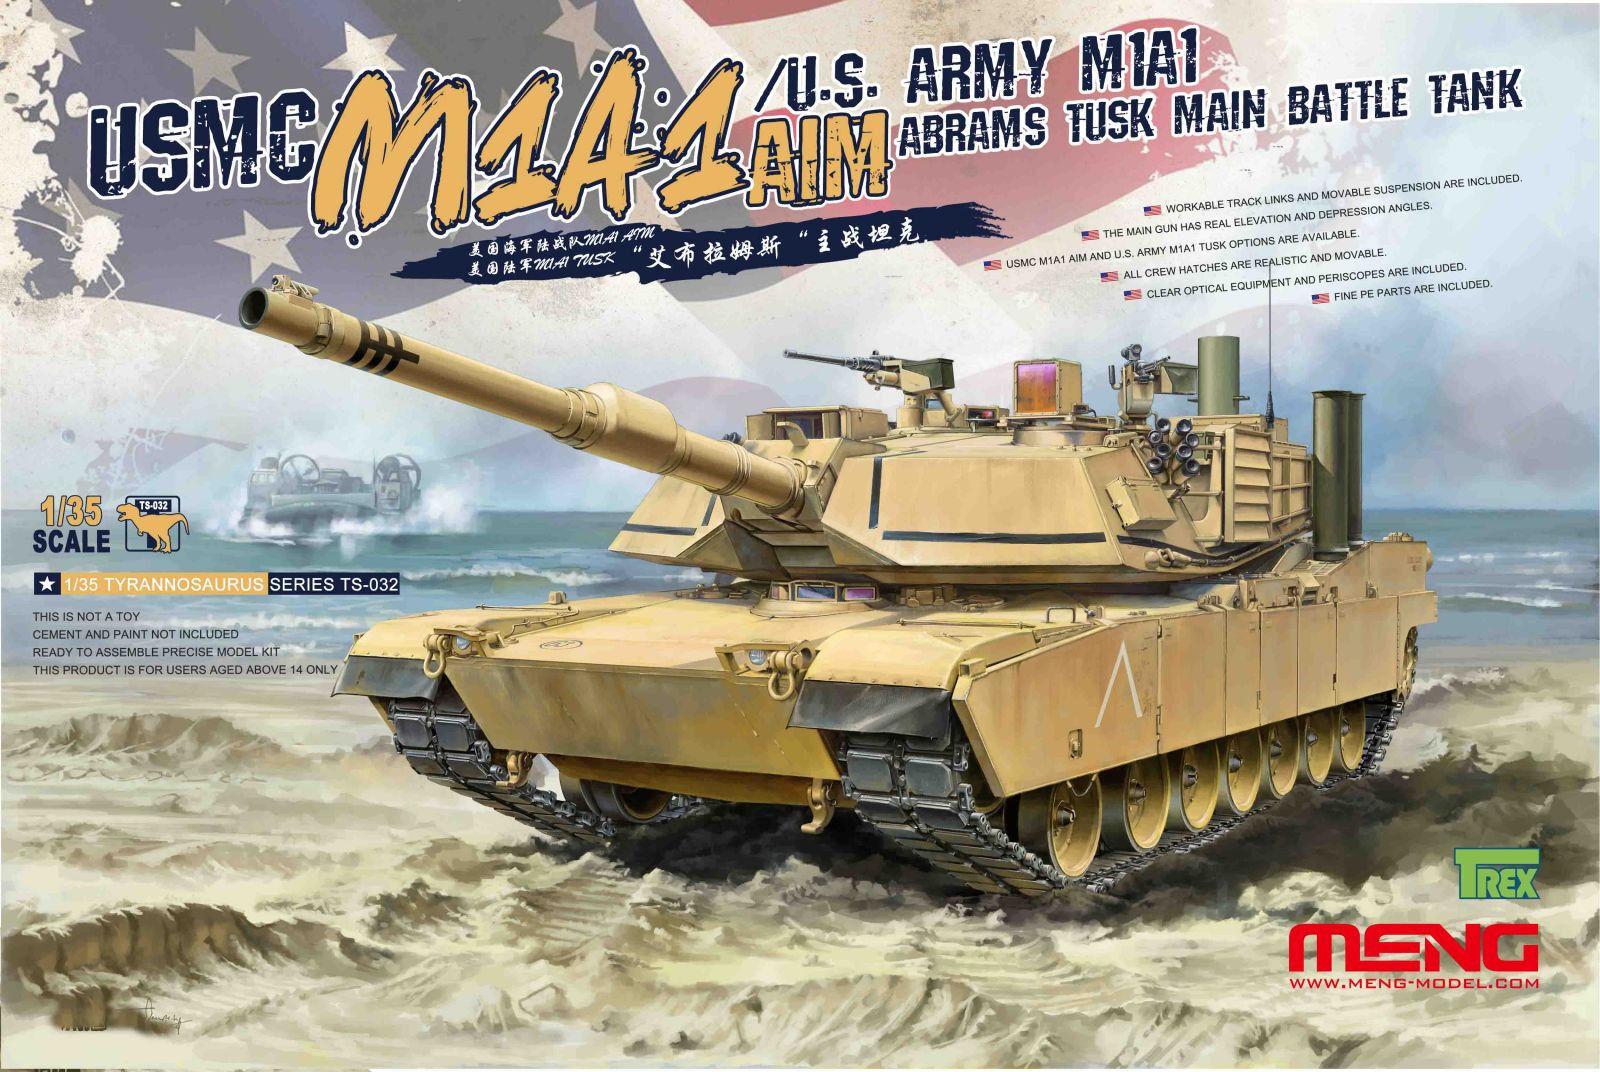 Meng Model TS-032 1 35th scale M1A1 Abrams TUSK Main Battle Tank